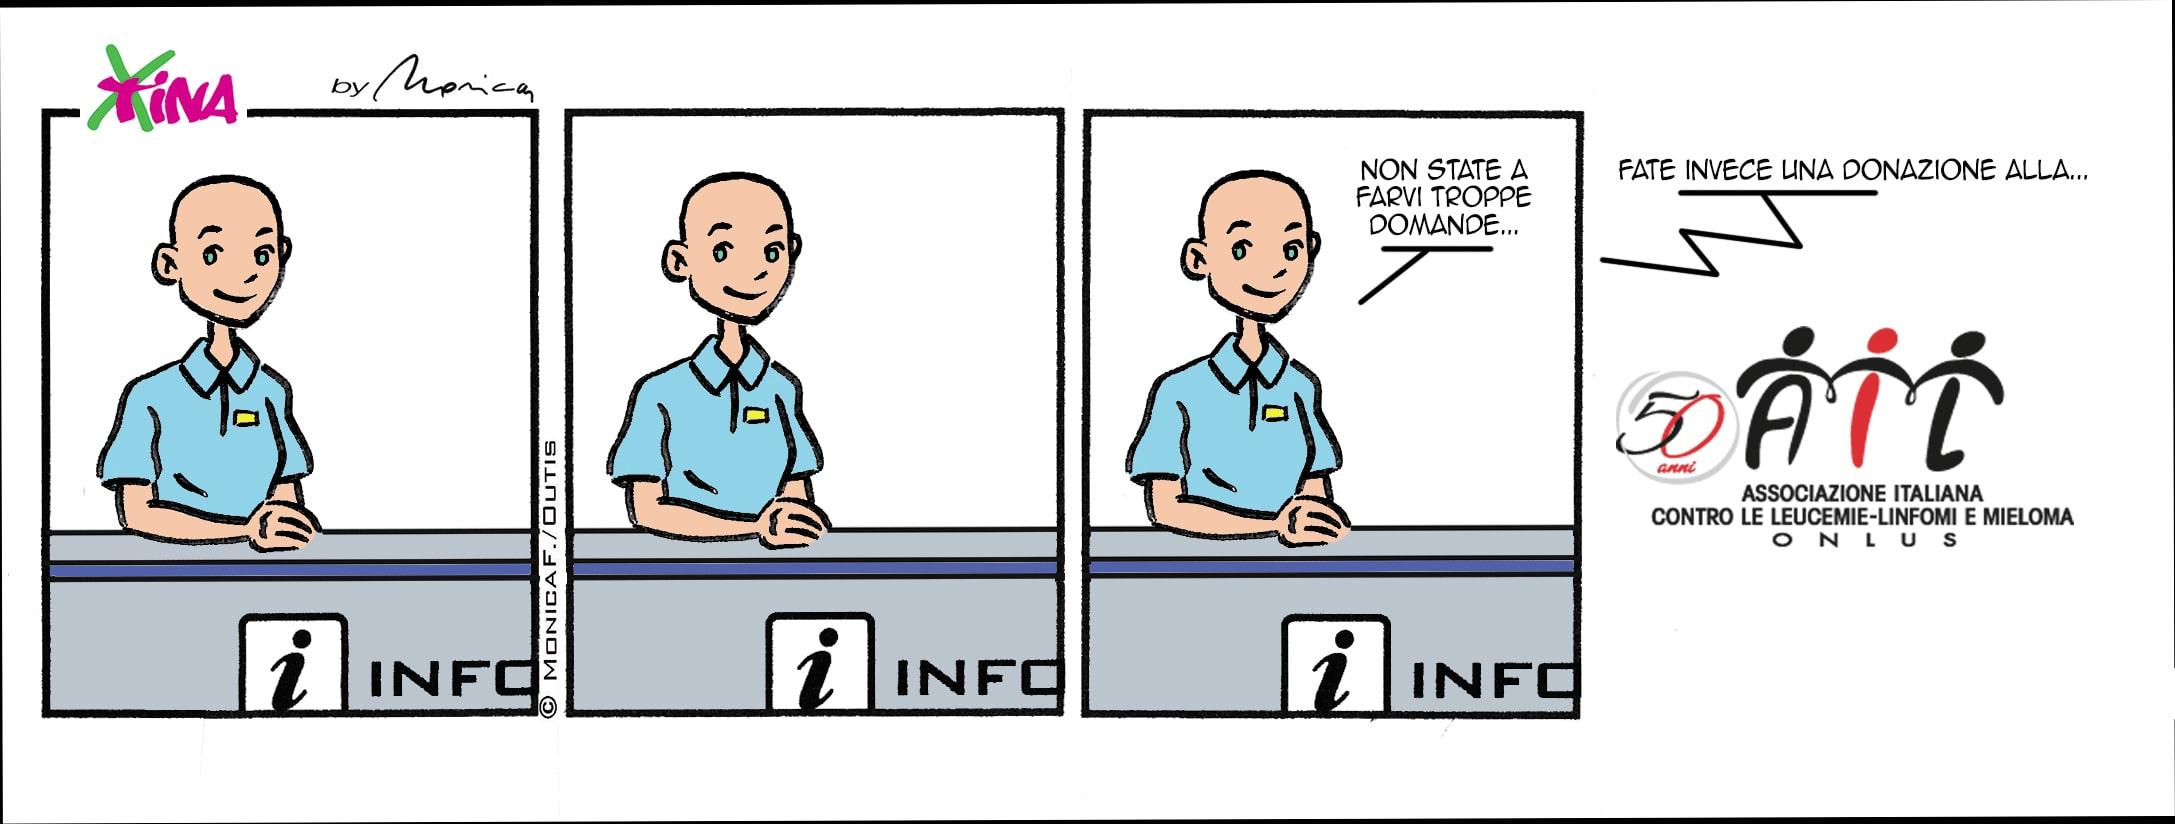 Xtina, comic strip not funny